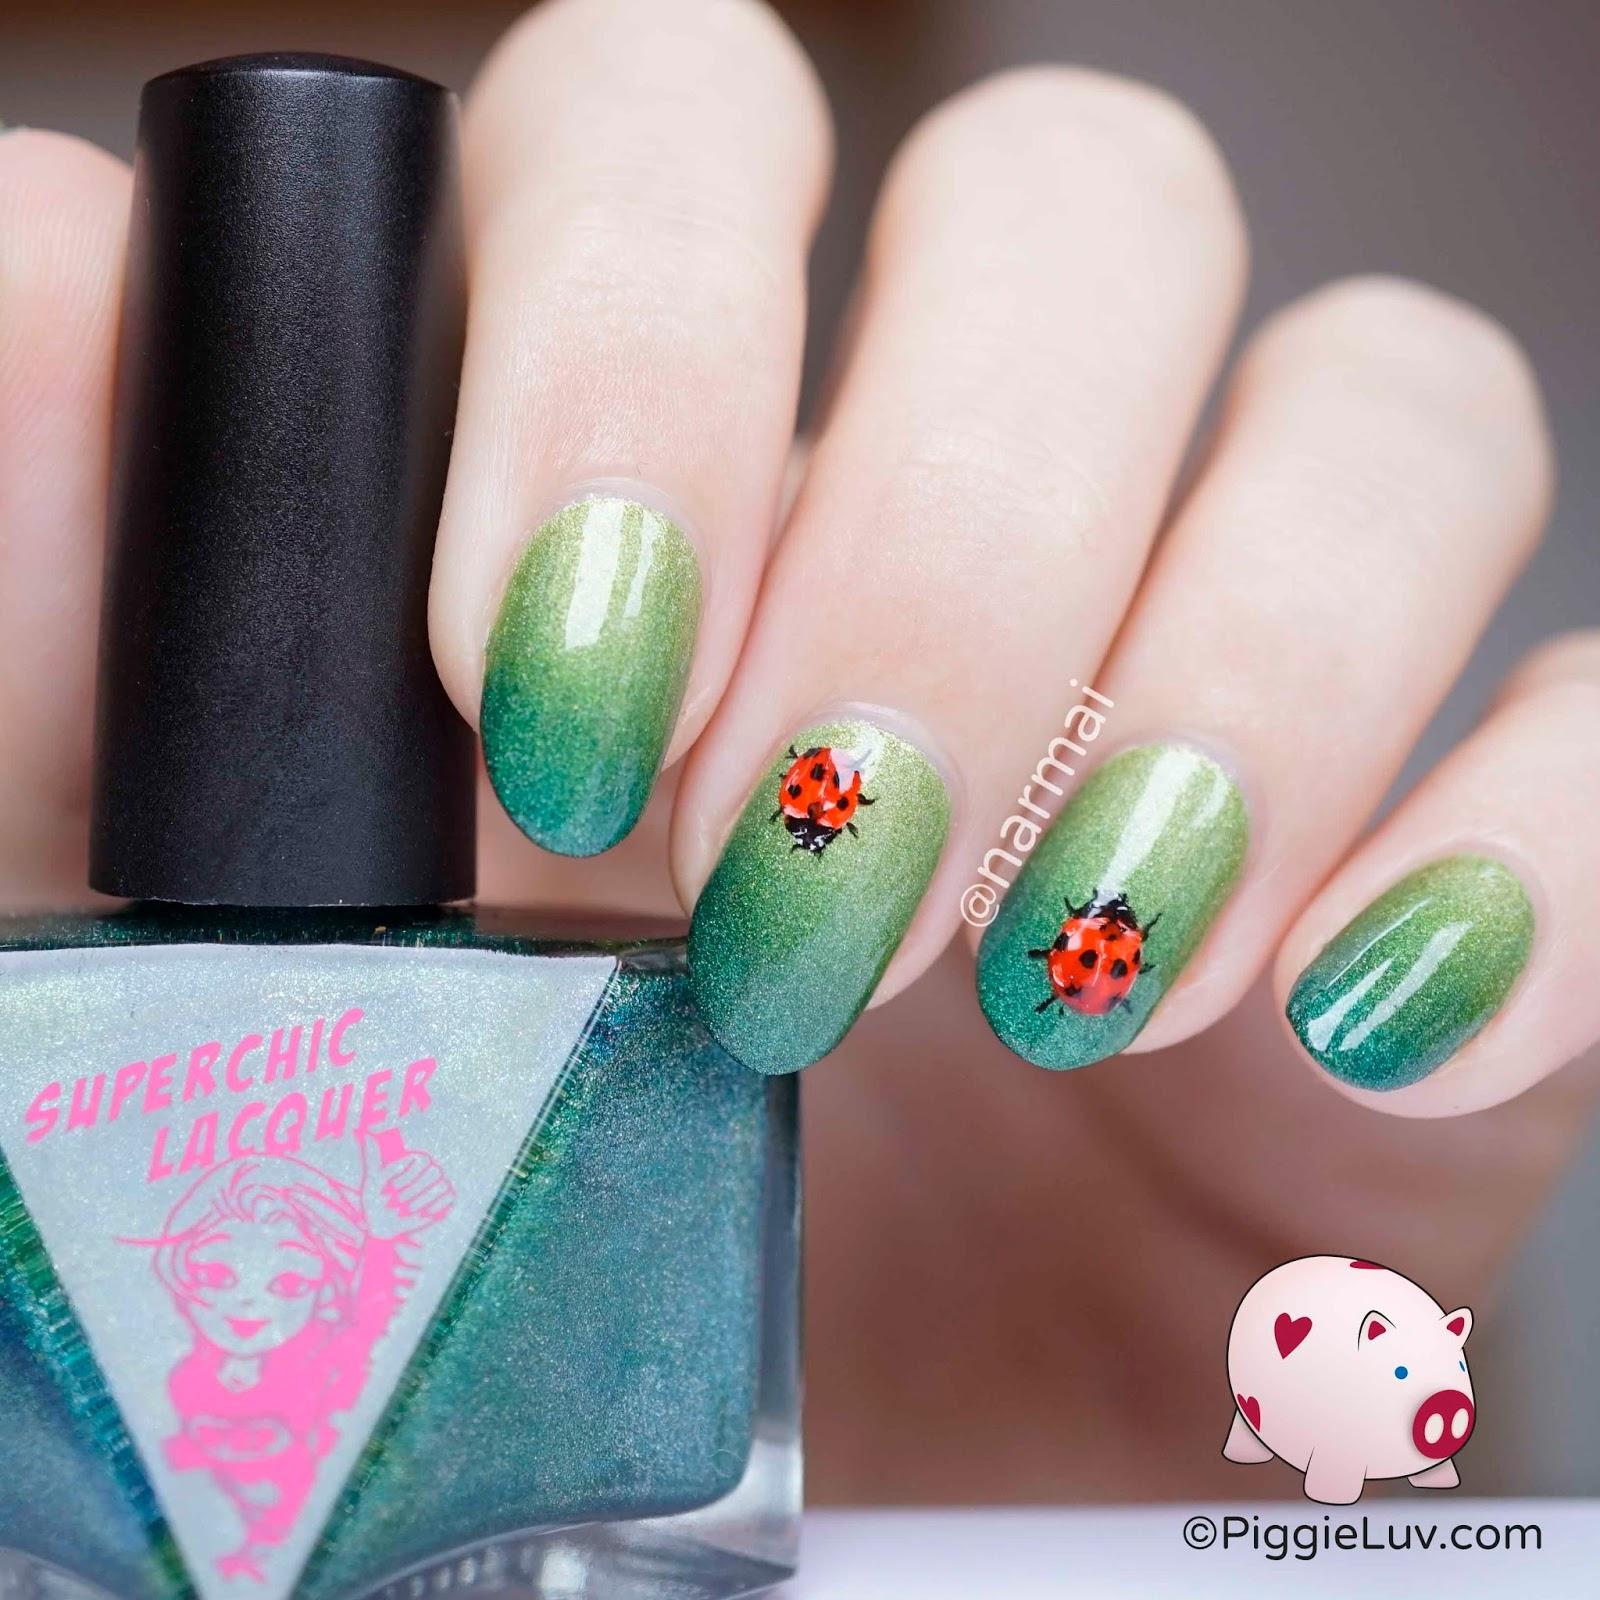 PiggieLuv: Freehand ladybug nail art